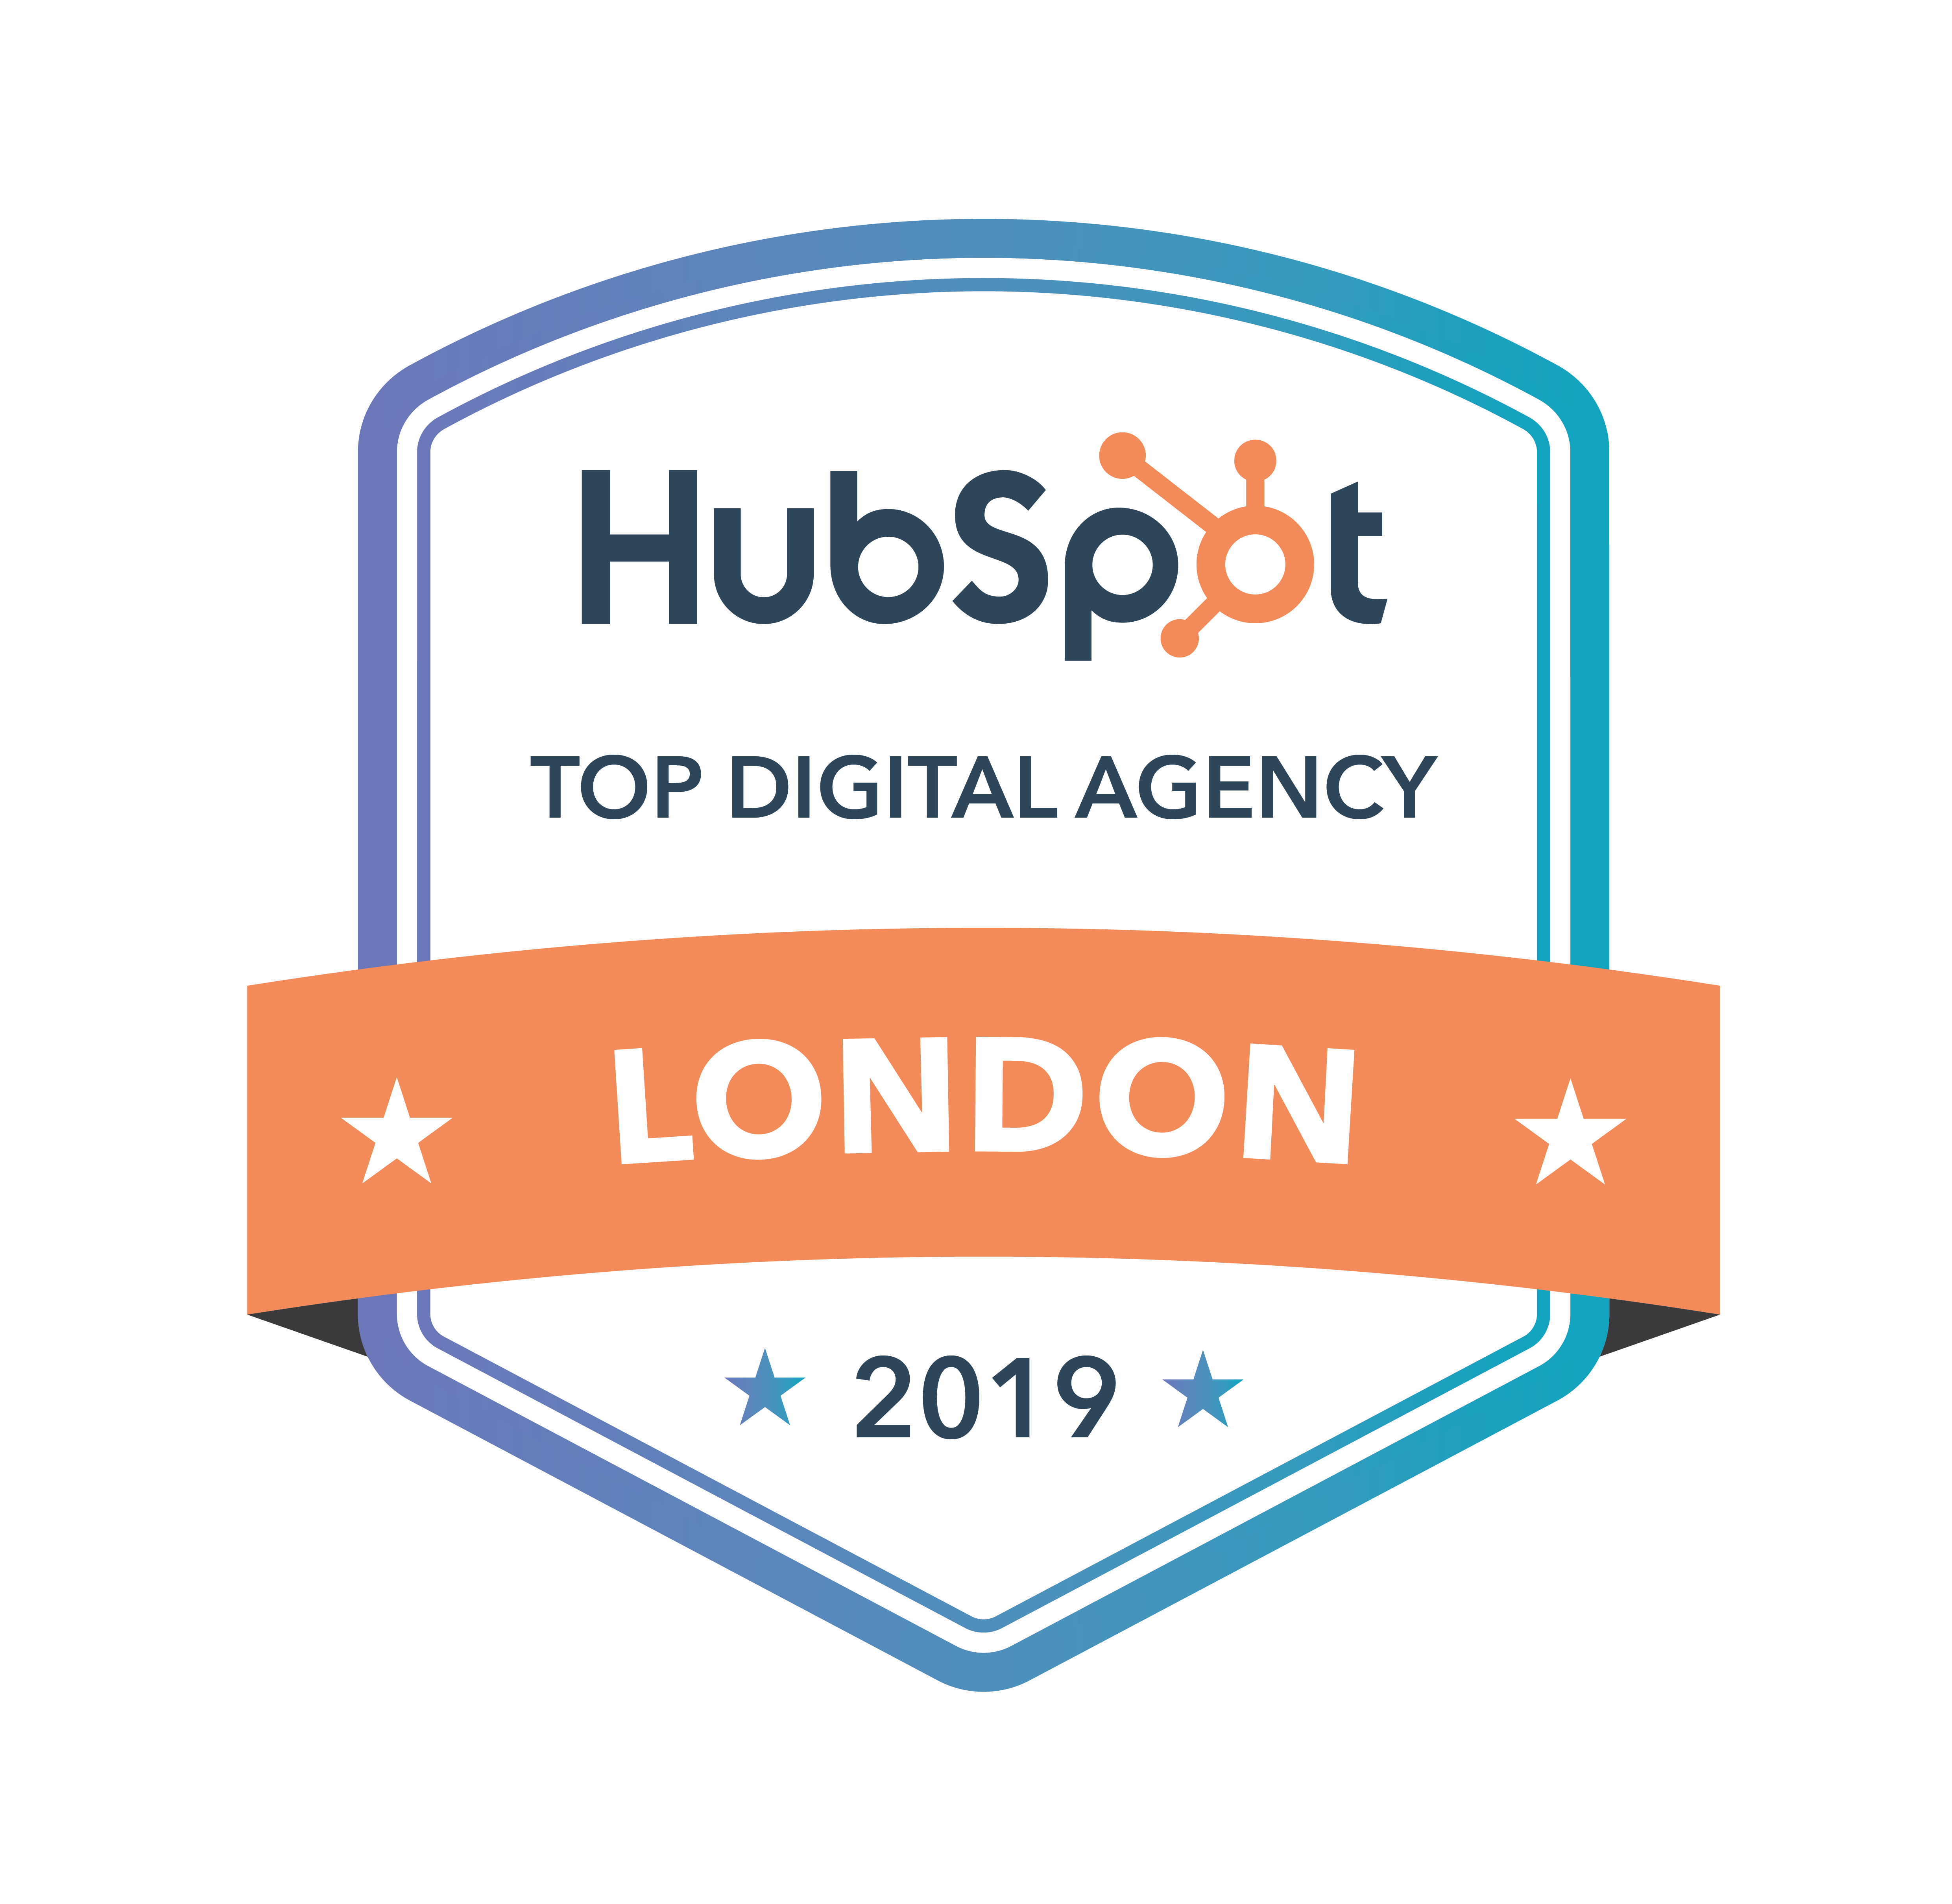 Top-Digital-Marketing-Agency-London-2019